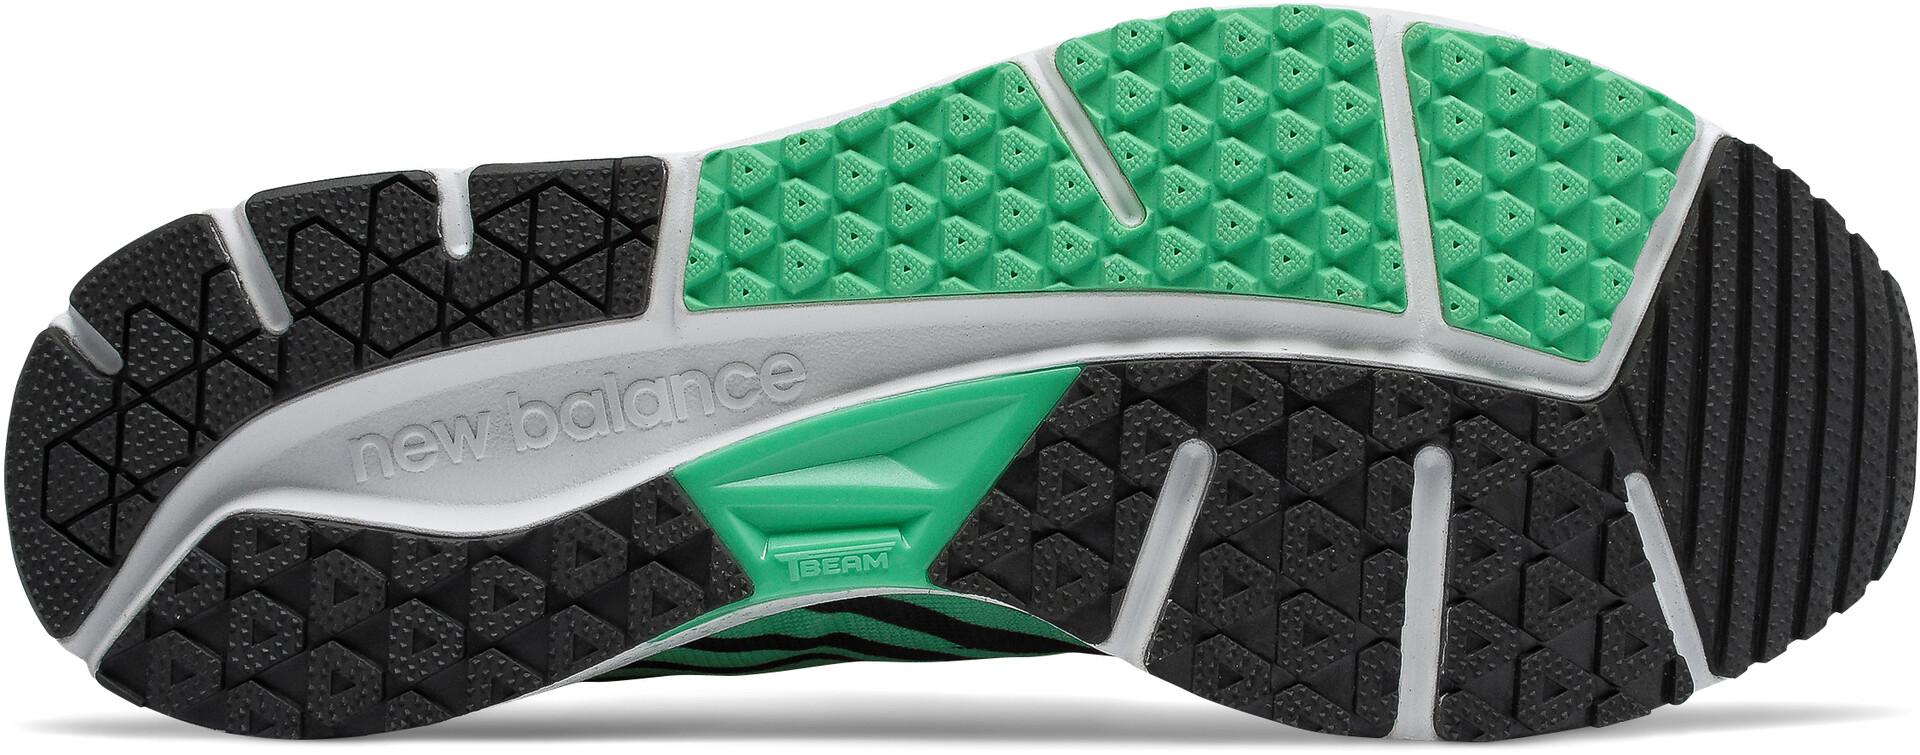 new balance hombres 1500 verdes